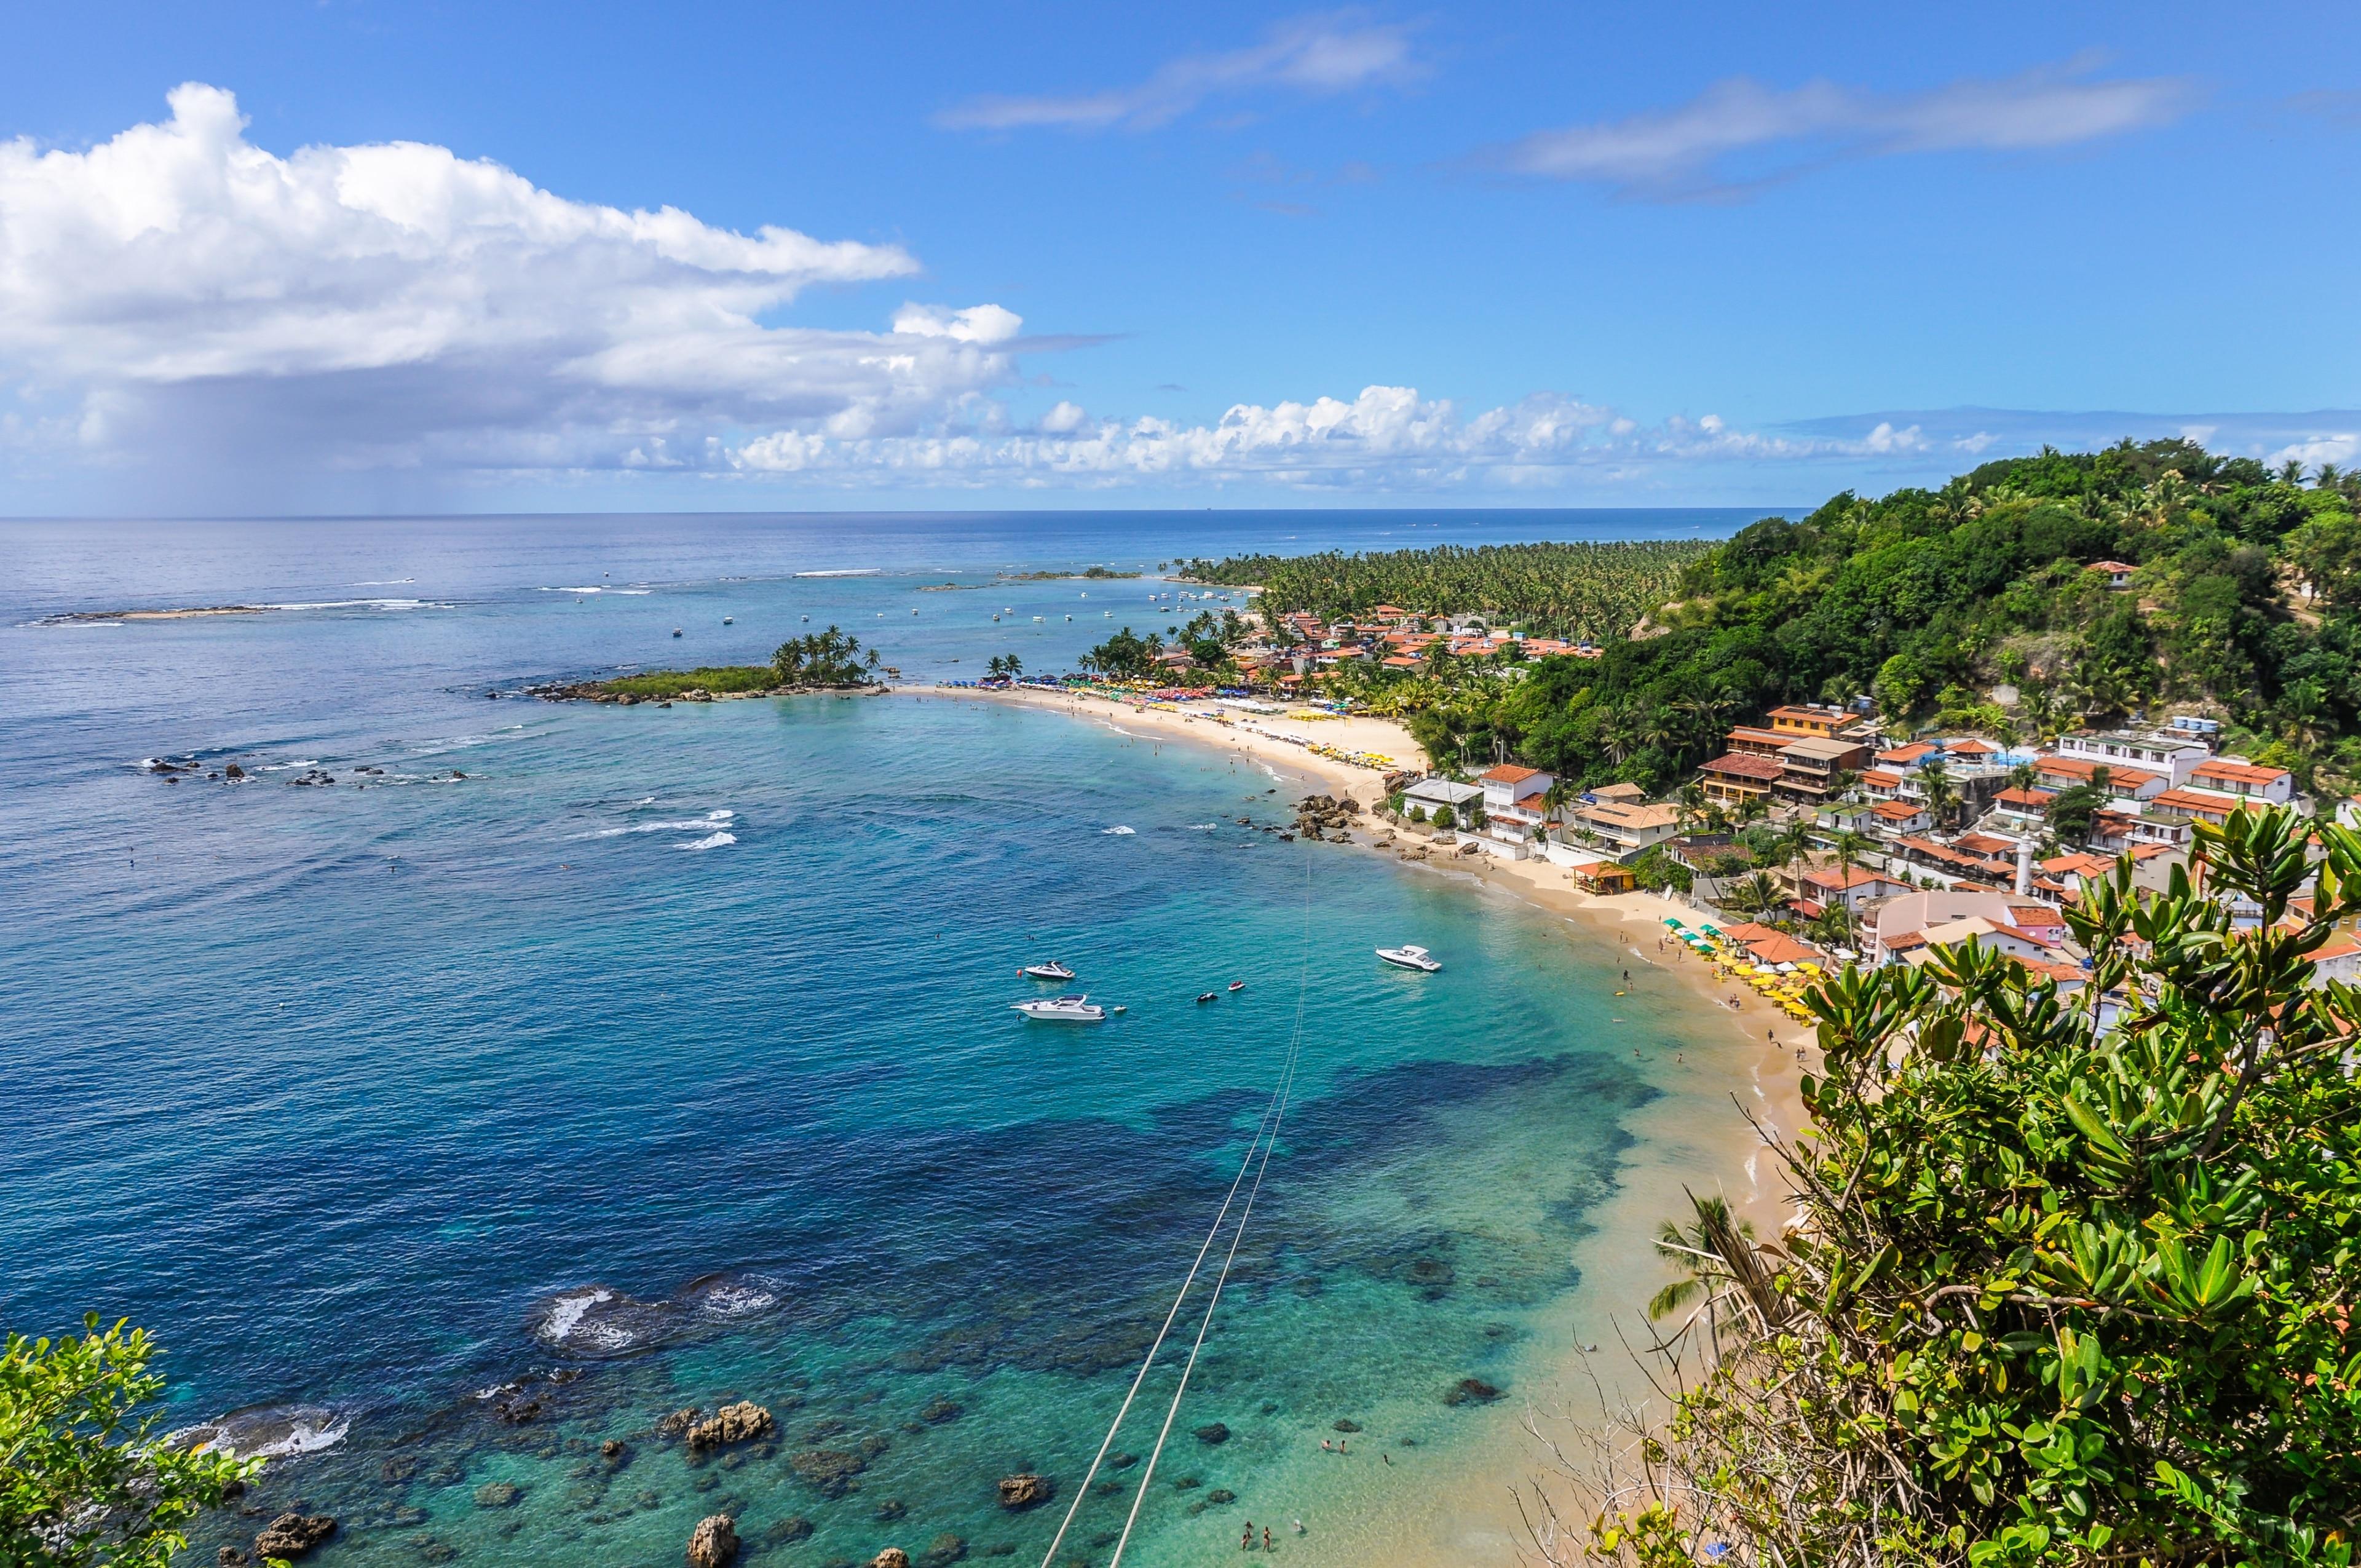 Cairu, Bahia (stat), Brasilien